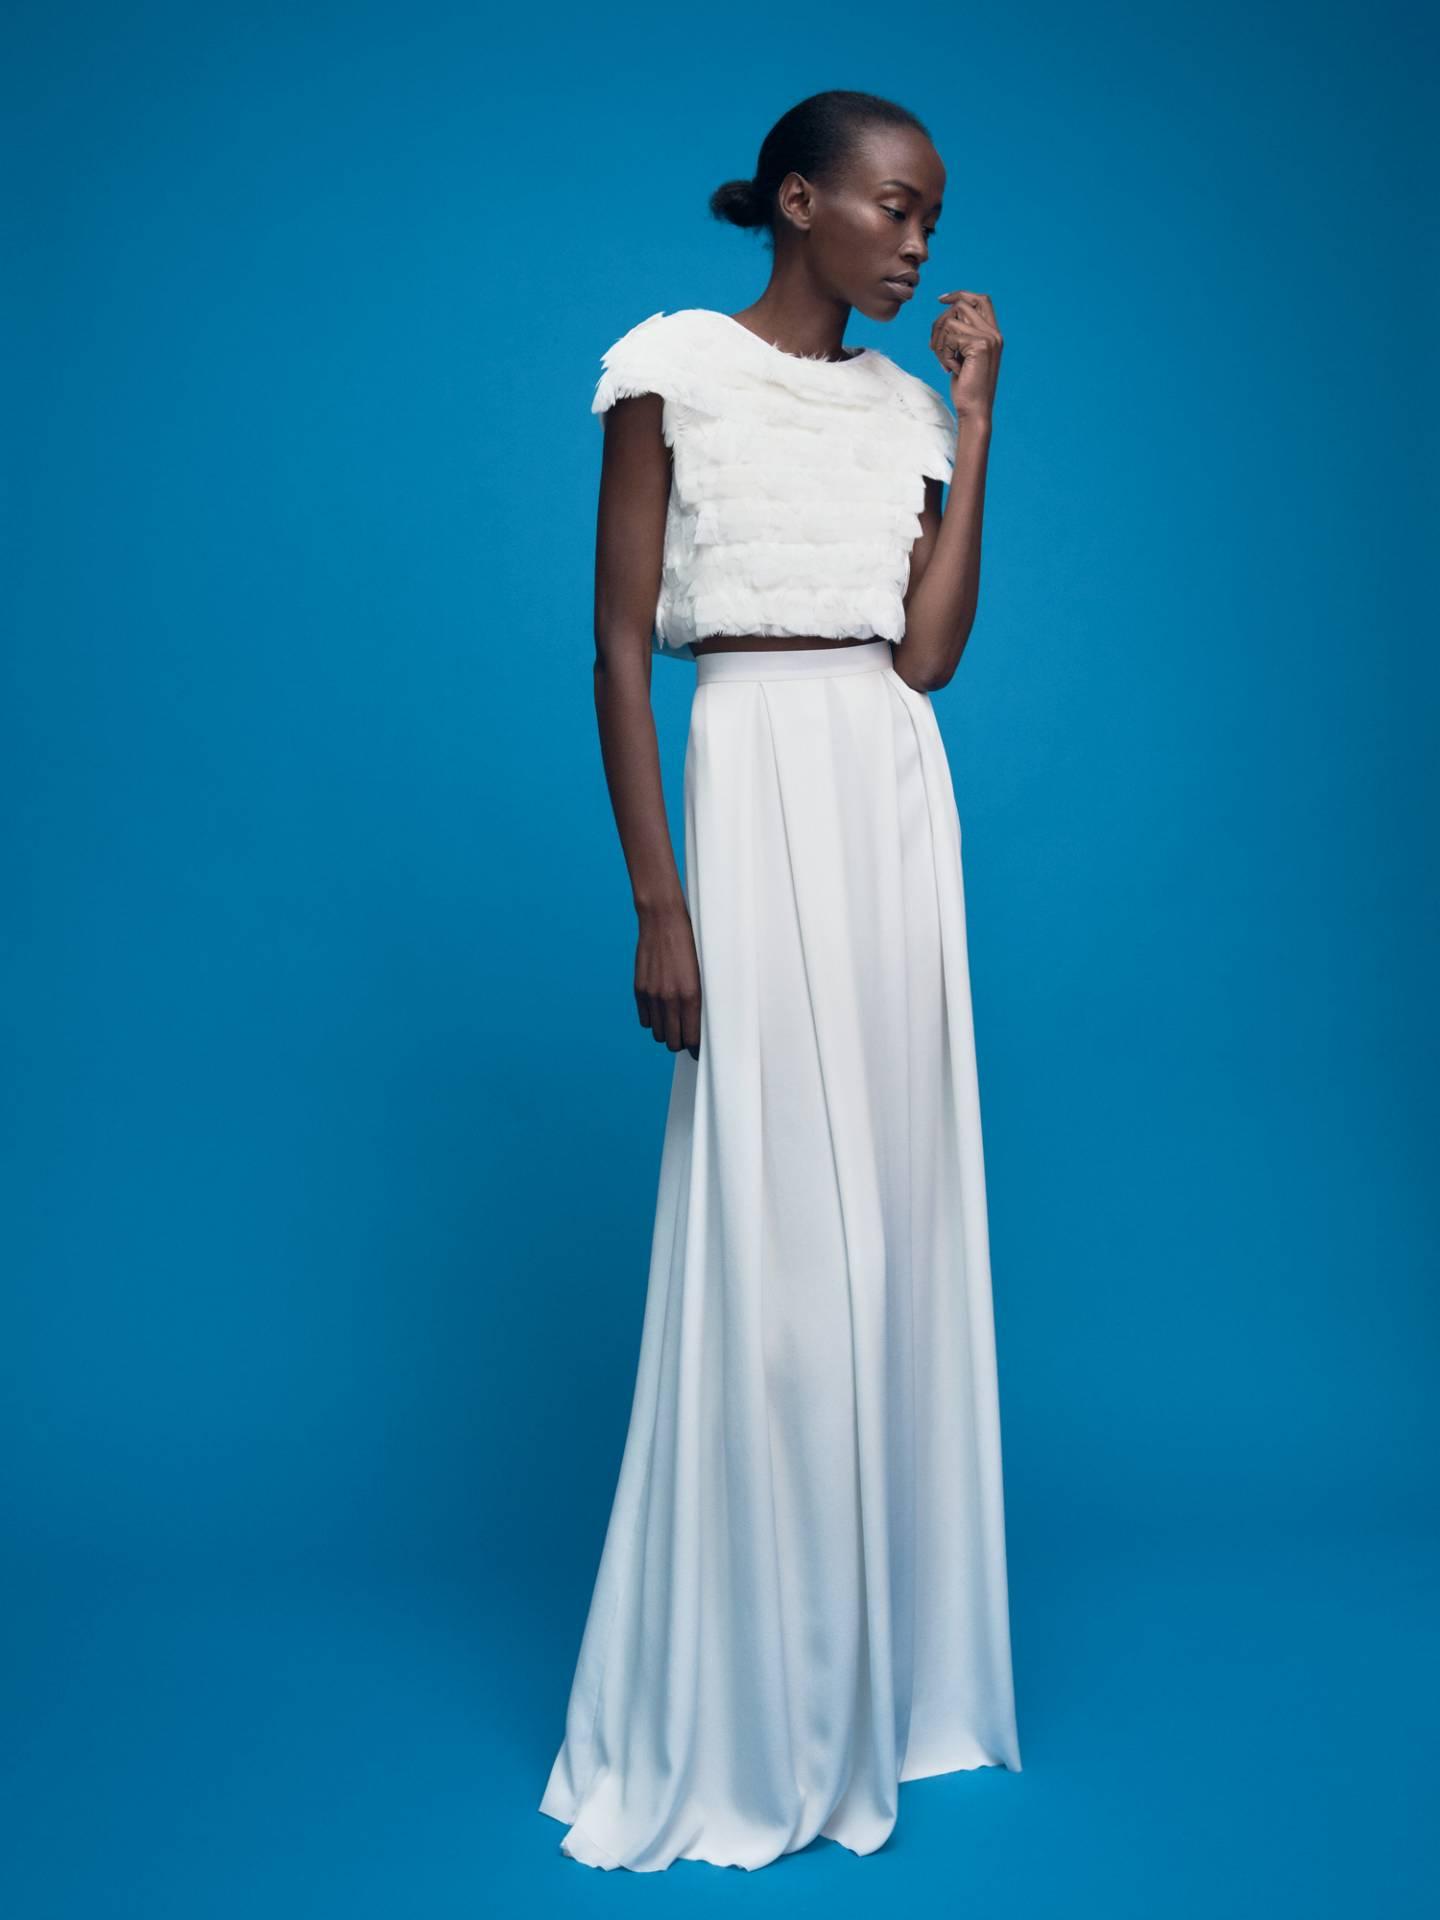 Bridal Feather Top Faye and Silk Skirt Grace by Magdalena Mayrock Berlin